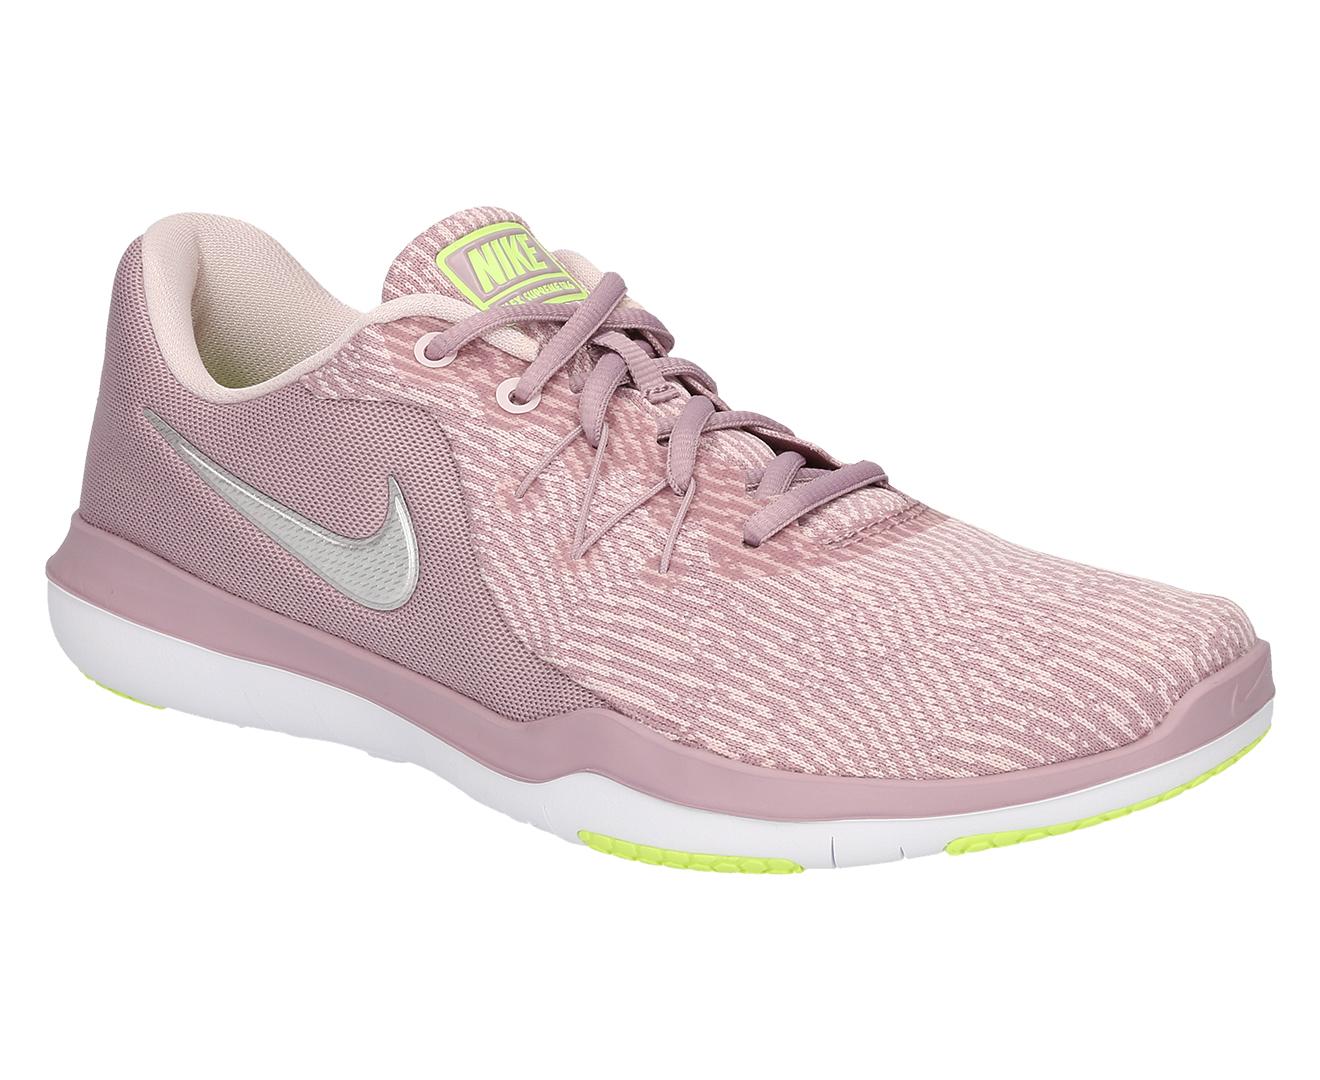 8eef222c6daa5 Nike Women s Flex Supreme TR 6 Shoe - Elemental Rose Metallic Silver ...